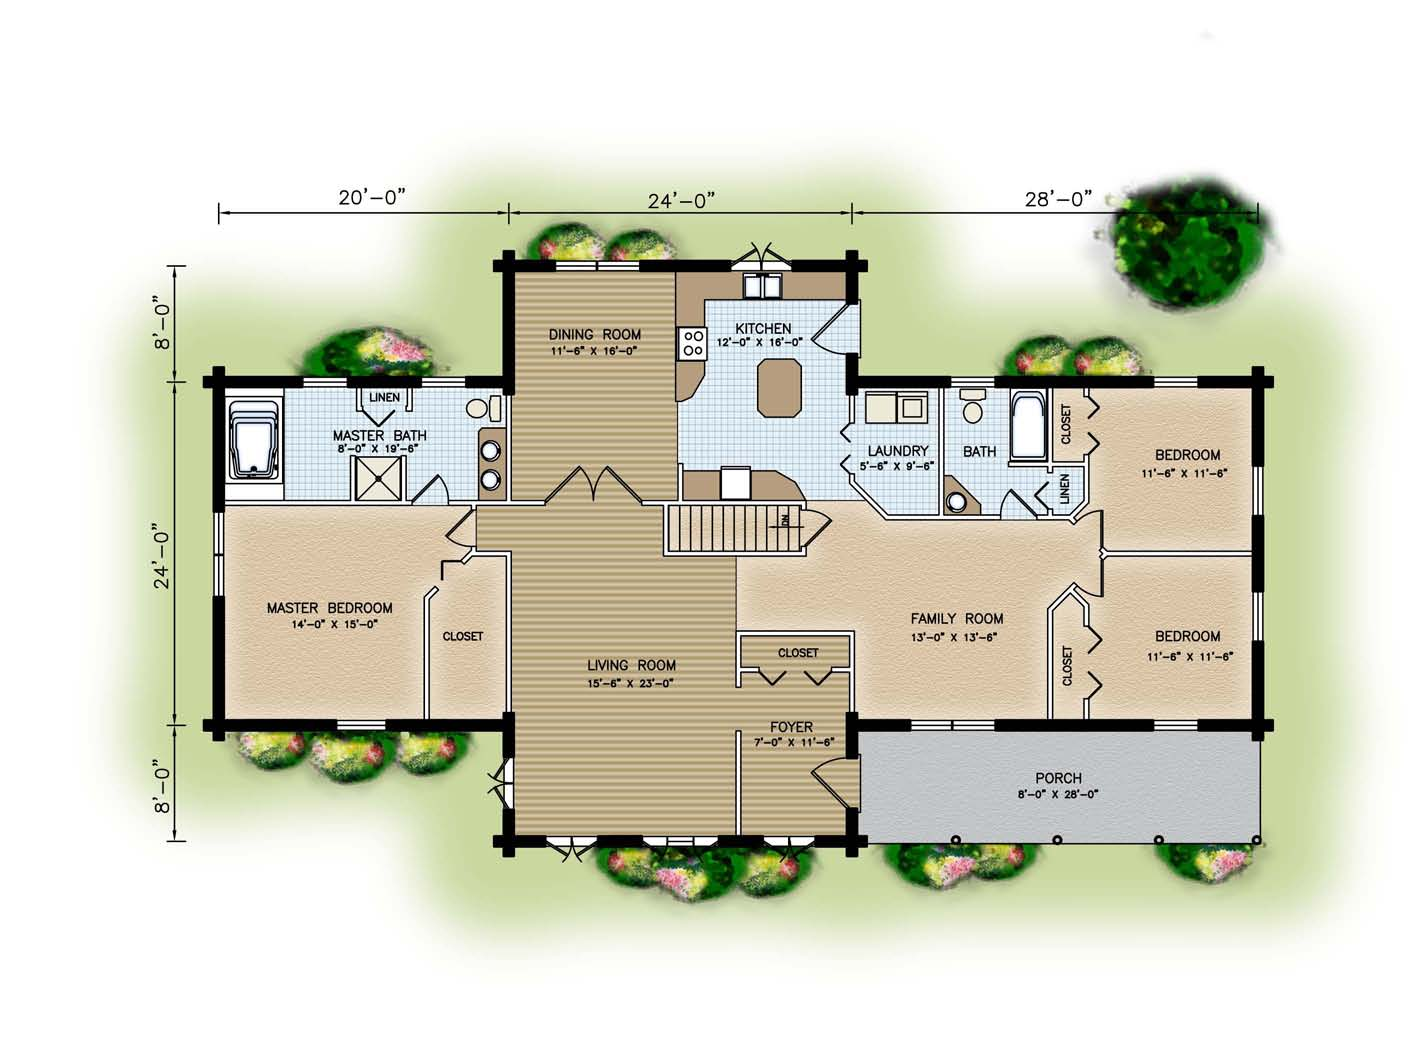 Floor Plans Easy Way Design Them Dream Home Designs House Plans 81692